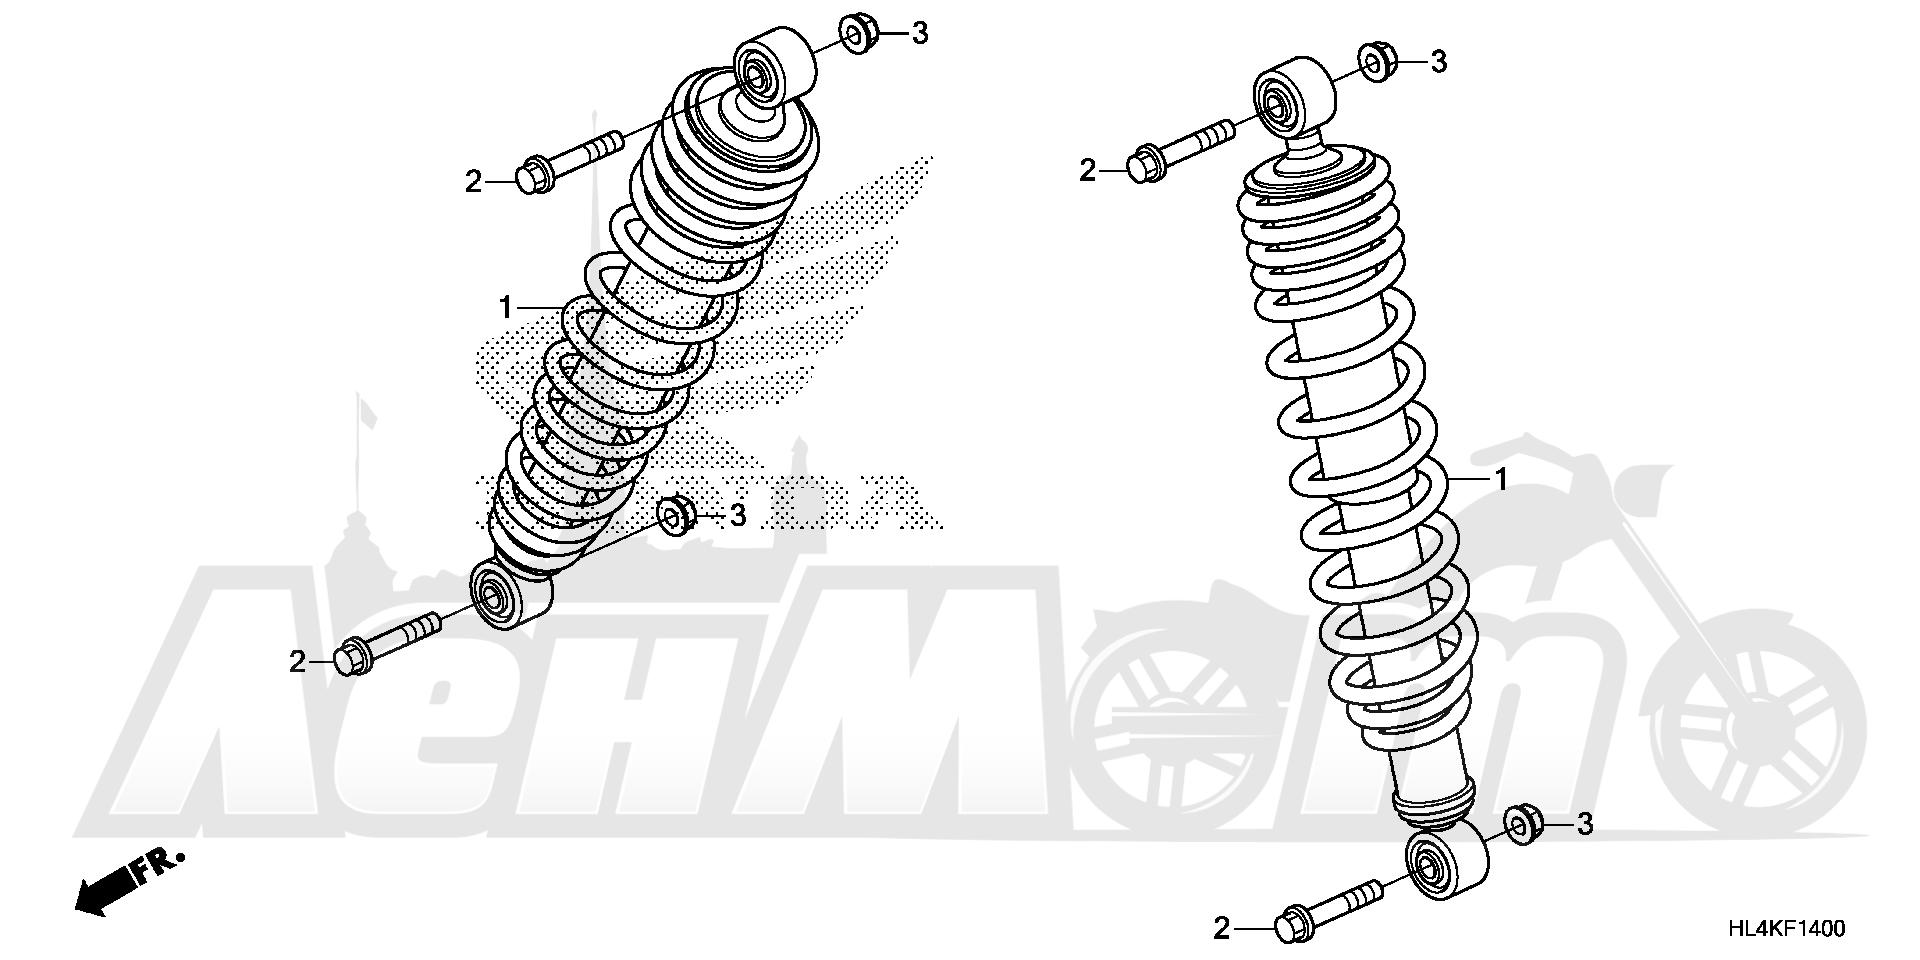 Запчасти для Квадроцикла Honda 2019 SXS1000M3L Раздел: FRONT CUSHION (1) | перед подкладка (1)